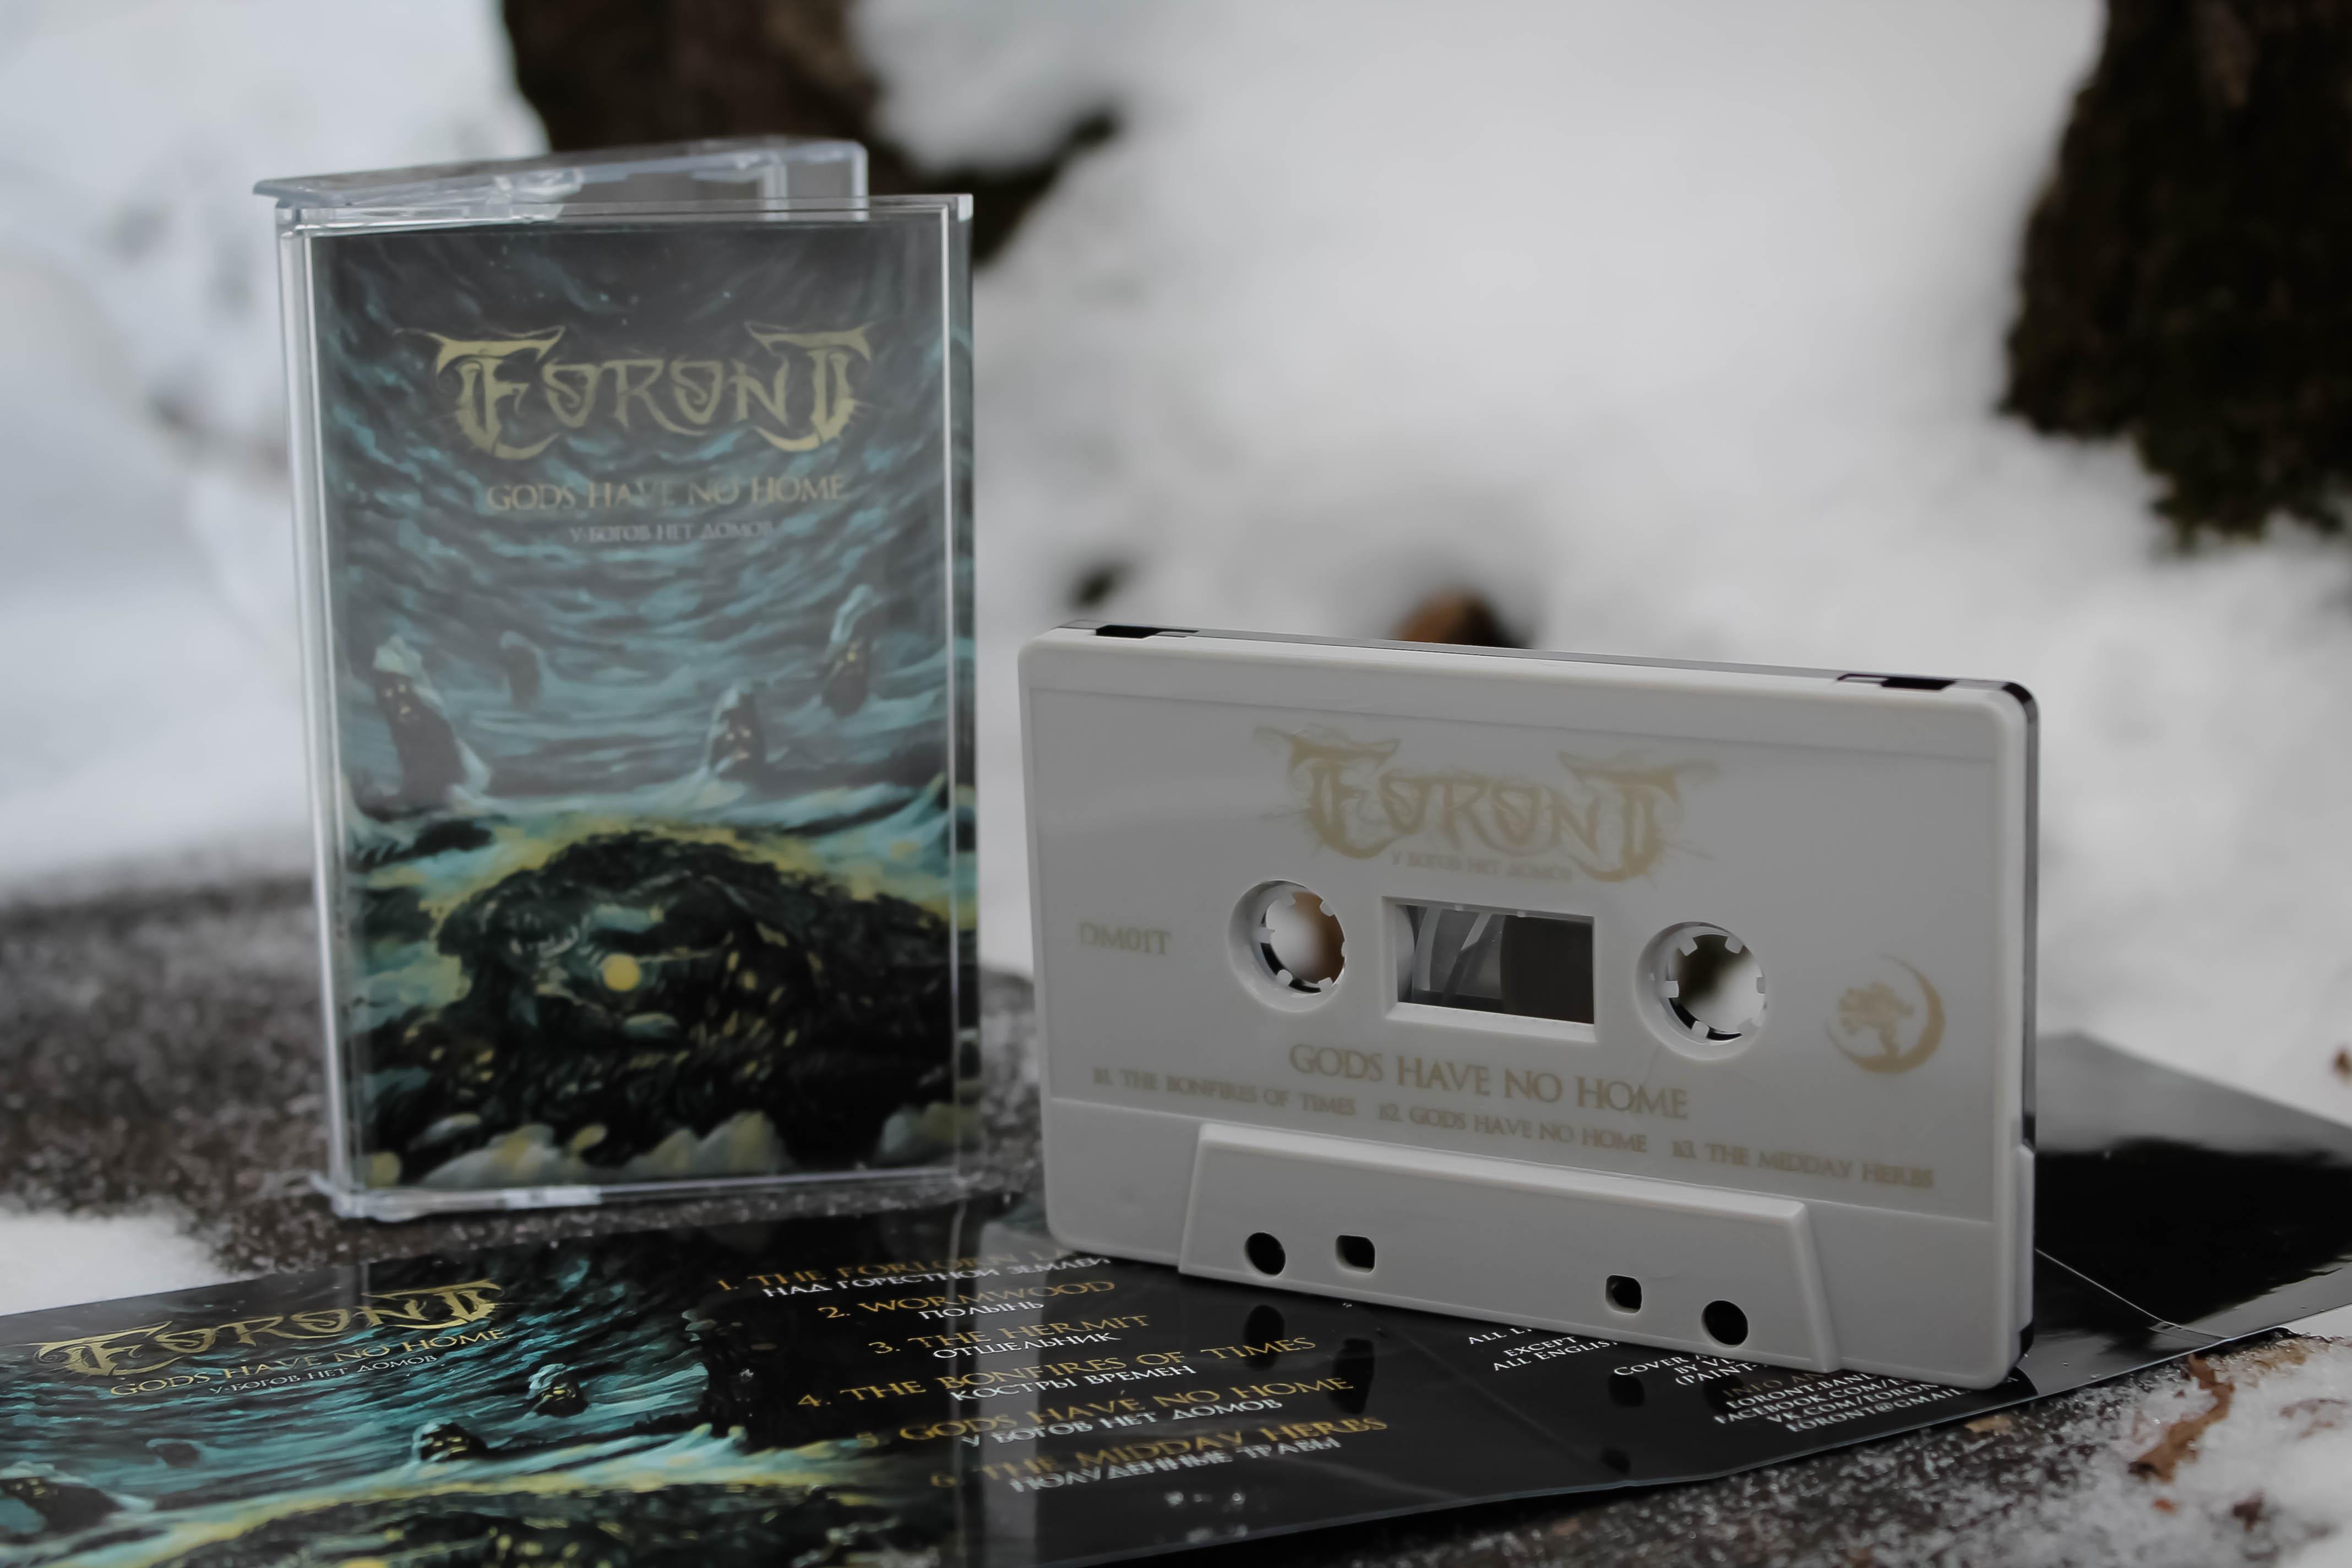 Eoront - Gods Have No Home, Cassette